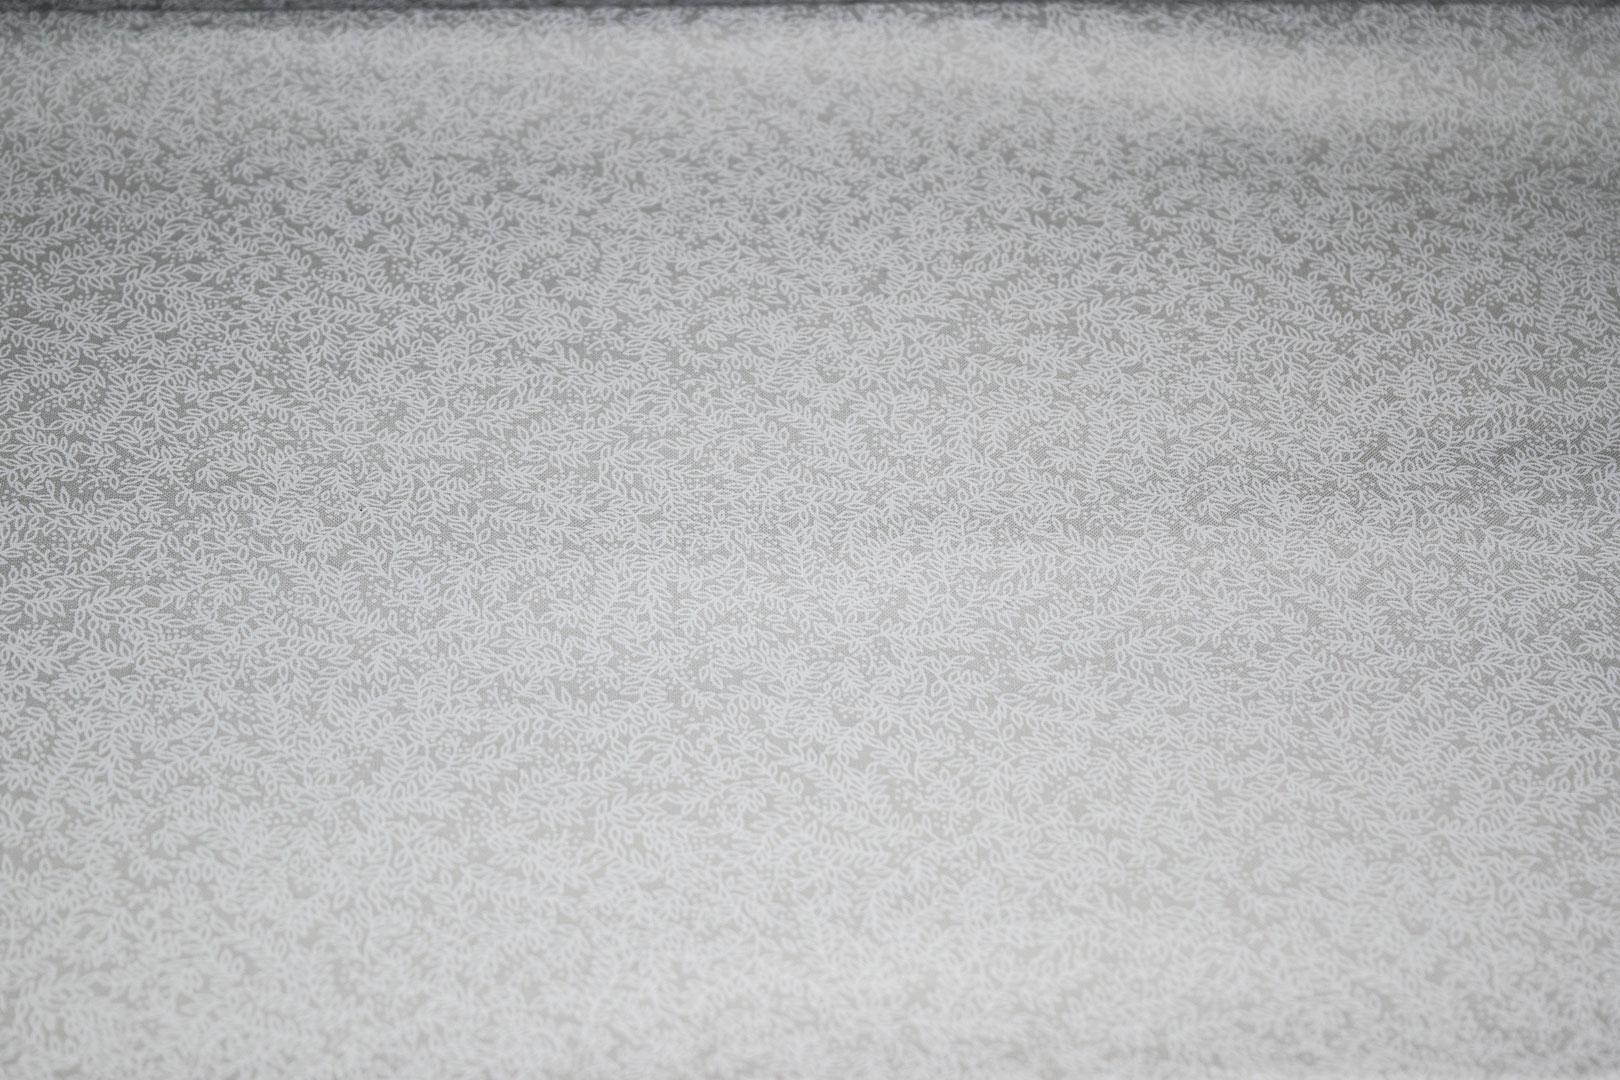 "8_37412_ww   44/45"" 68/68, 100% Carded Cotton"